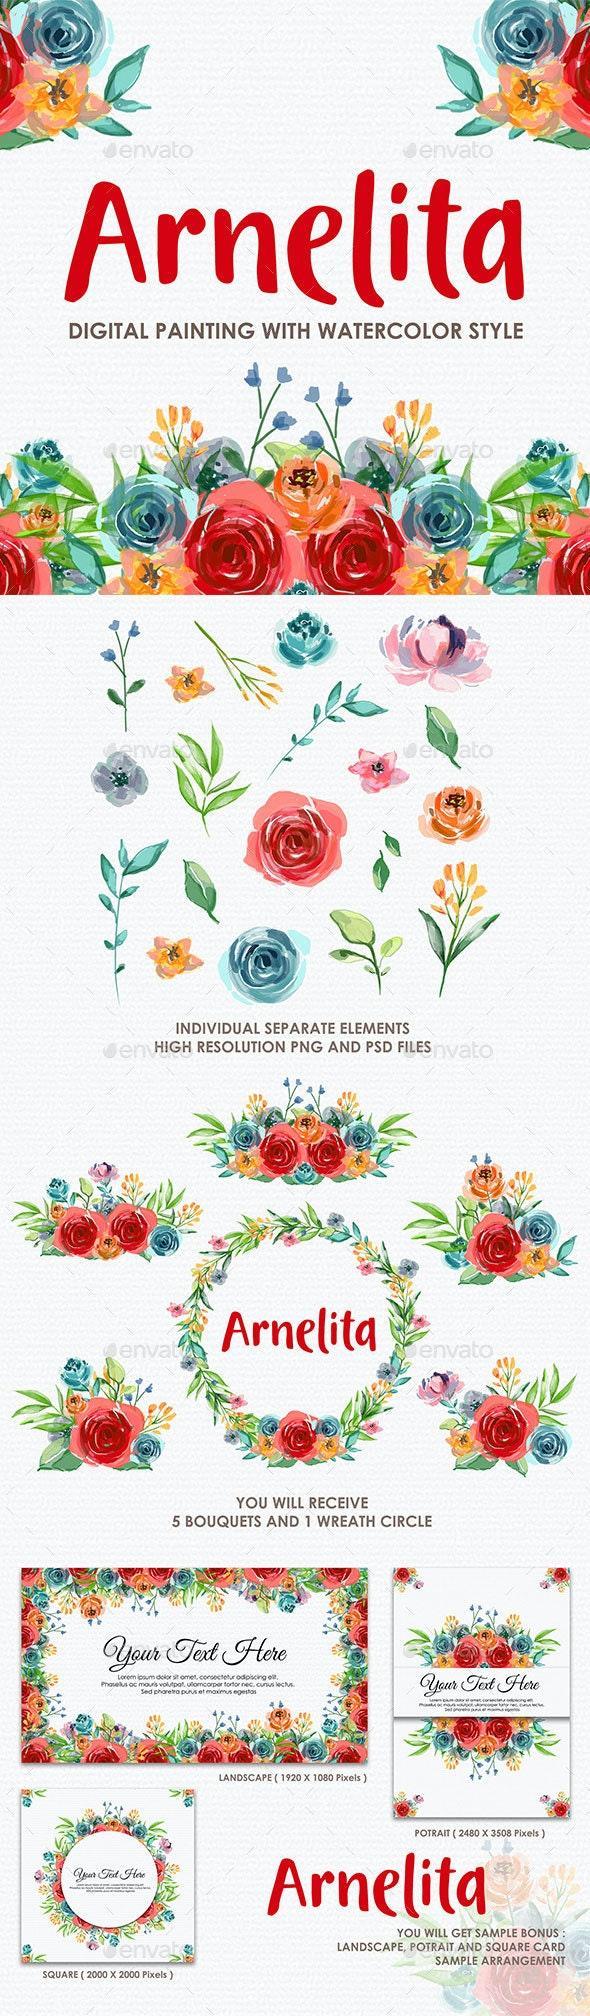 Arnelita - Watercolor Digital Painting Floral Flowers Style - Decorative Graphics